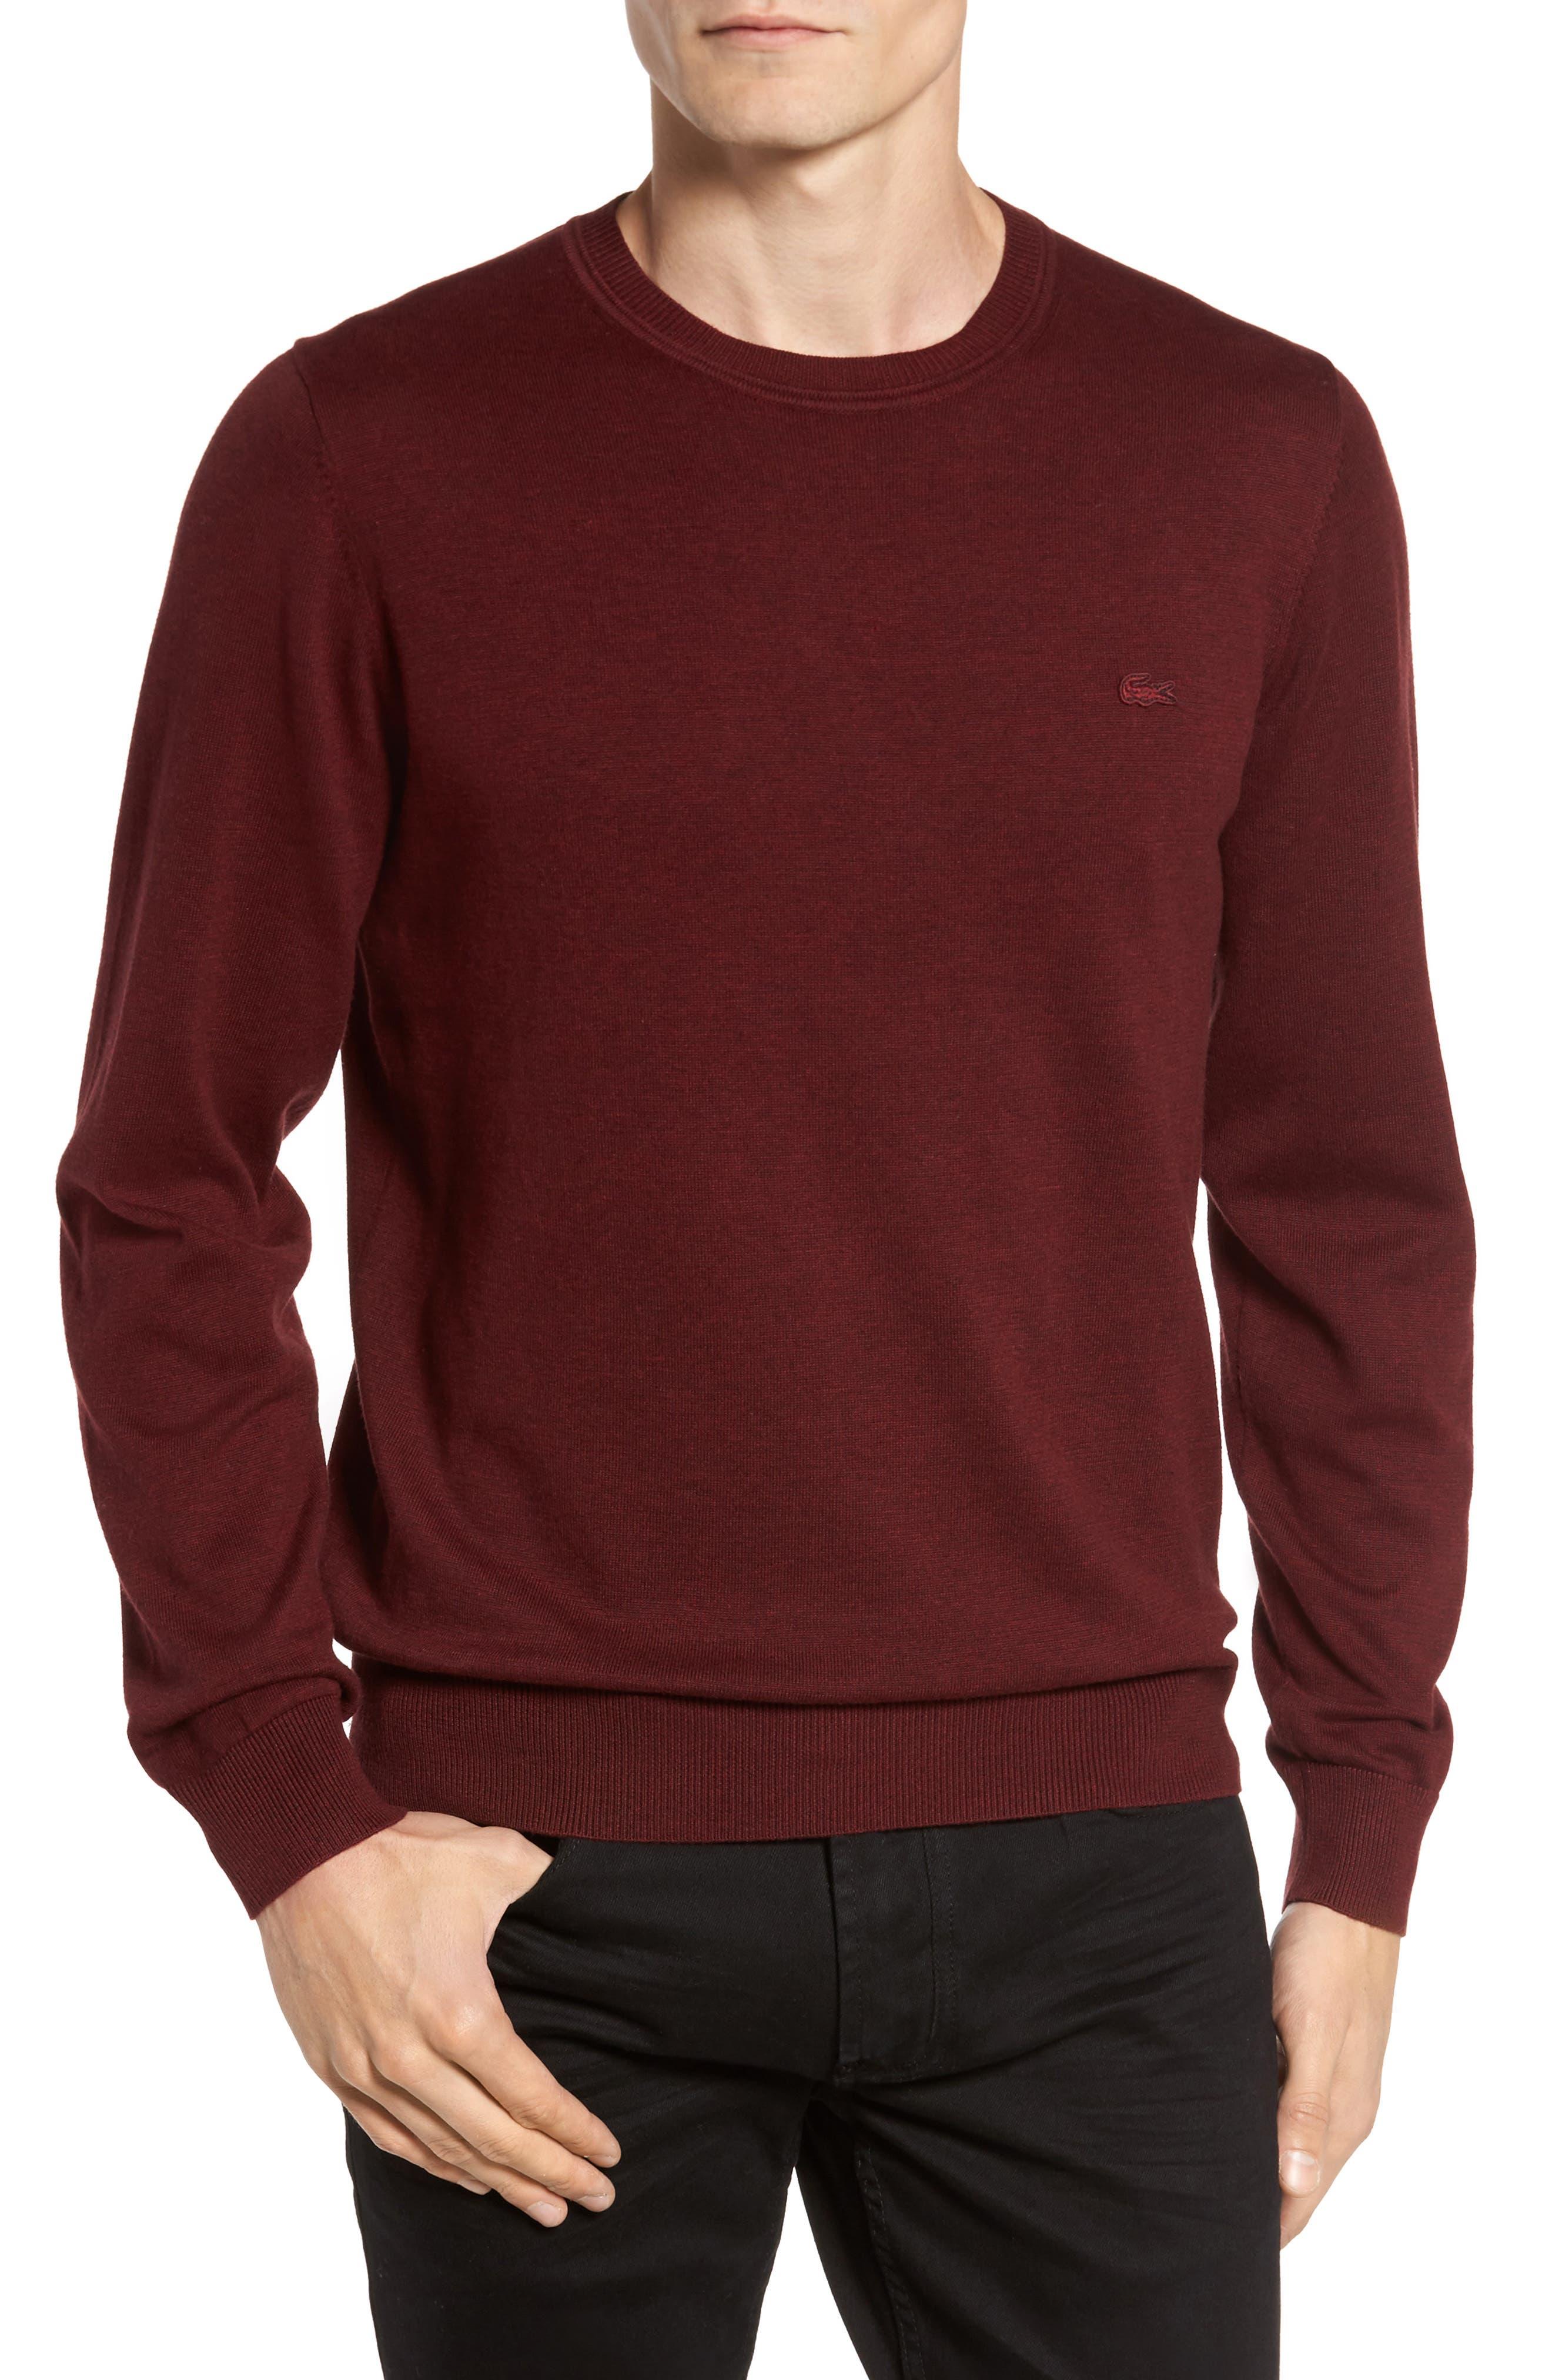 Lacoste Jersey Knit Crewneck Sweater